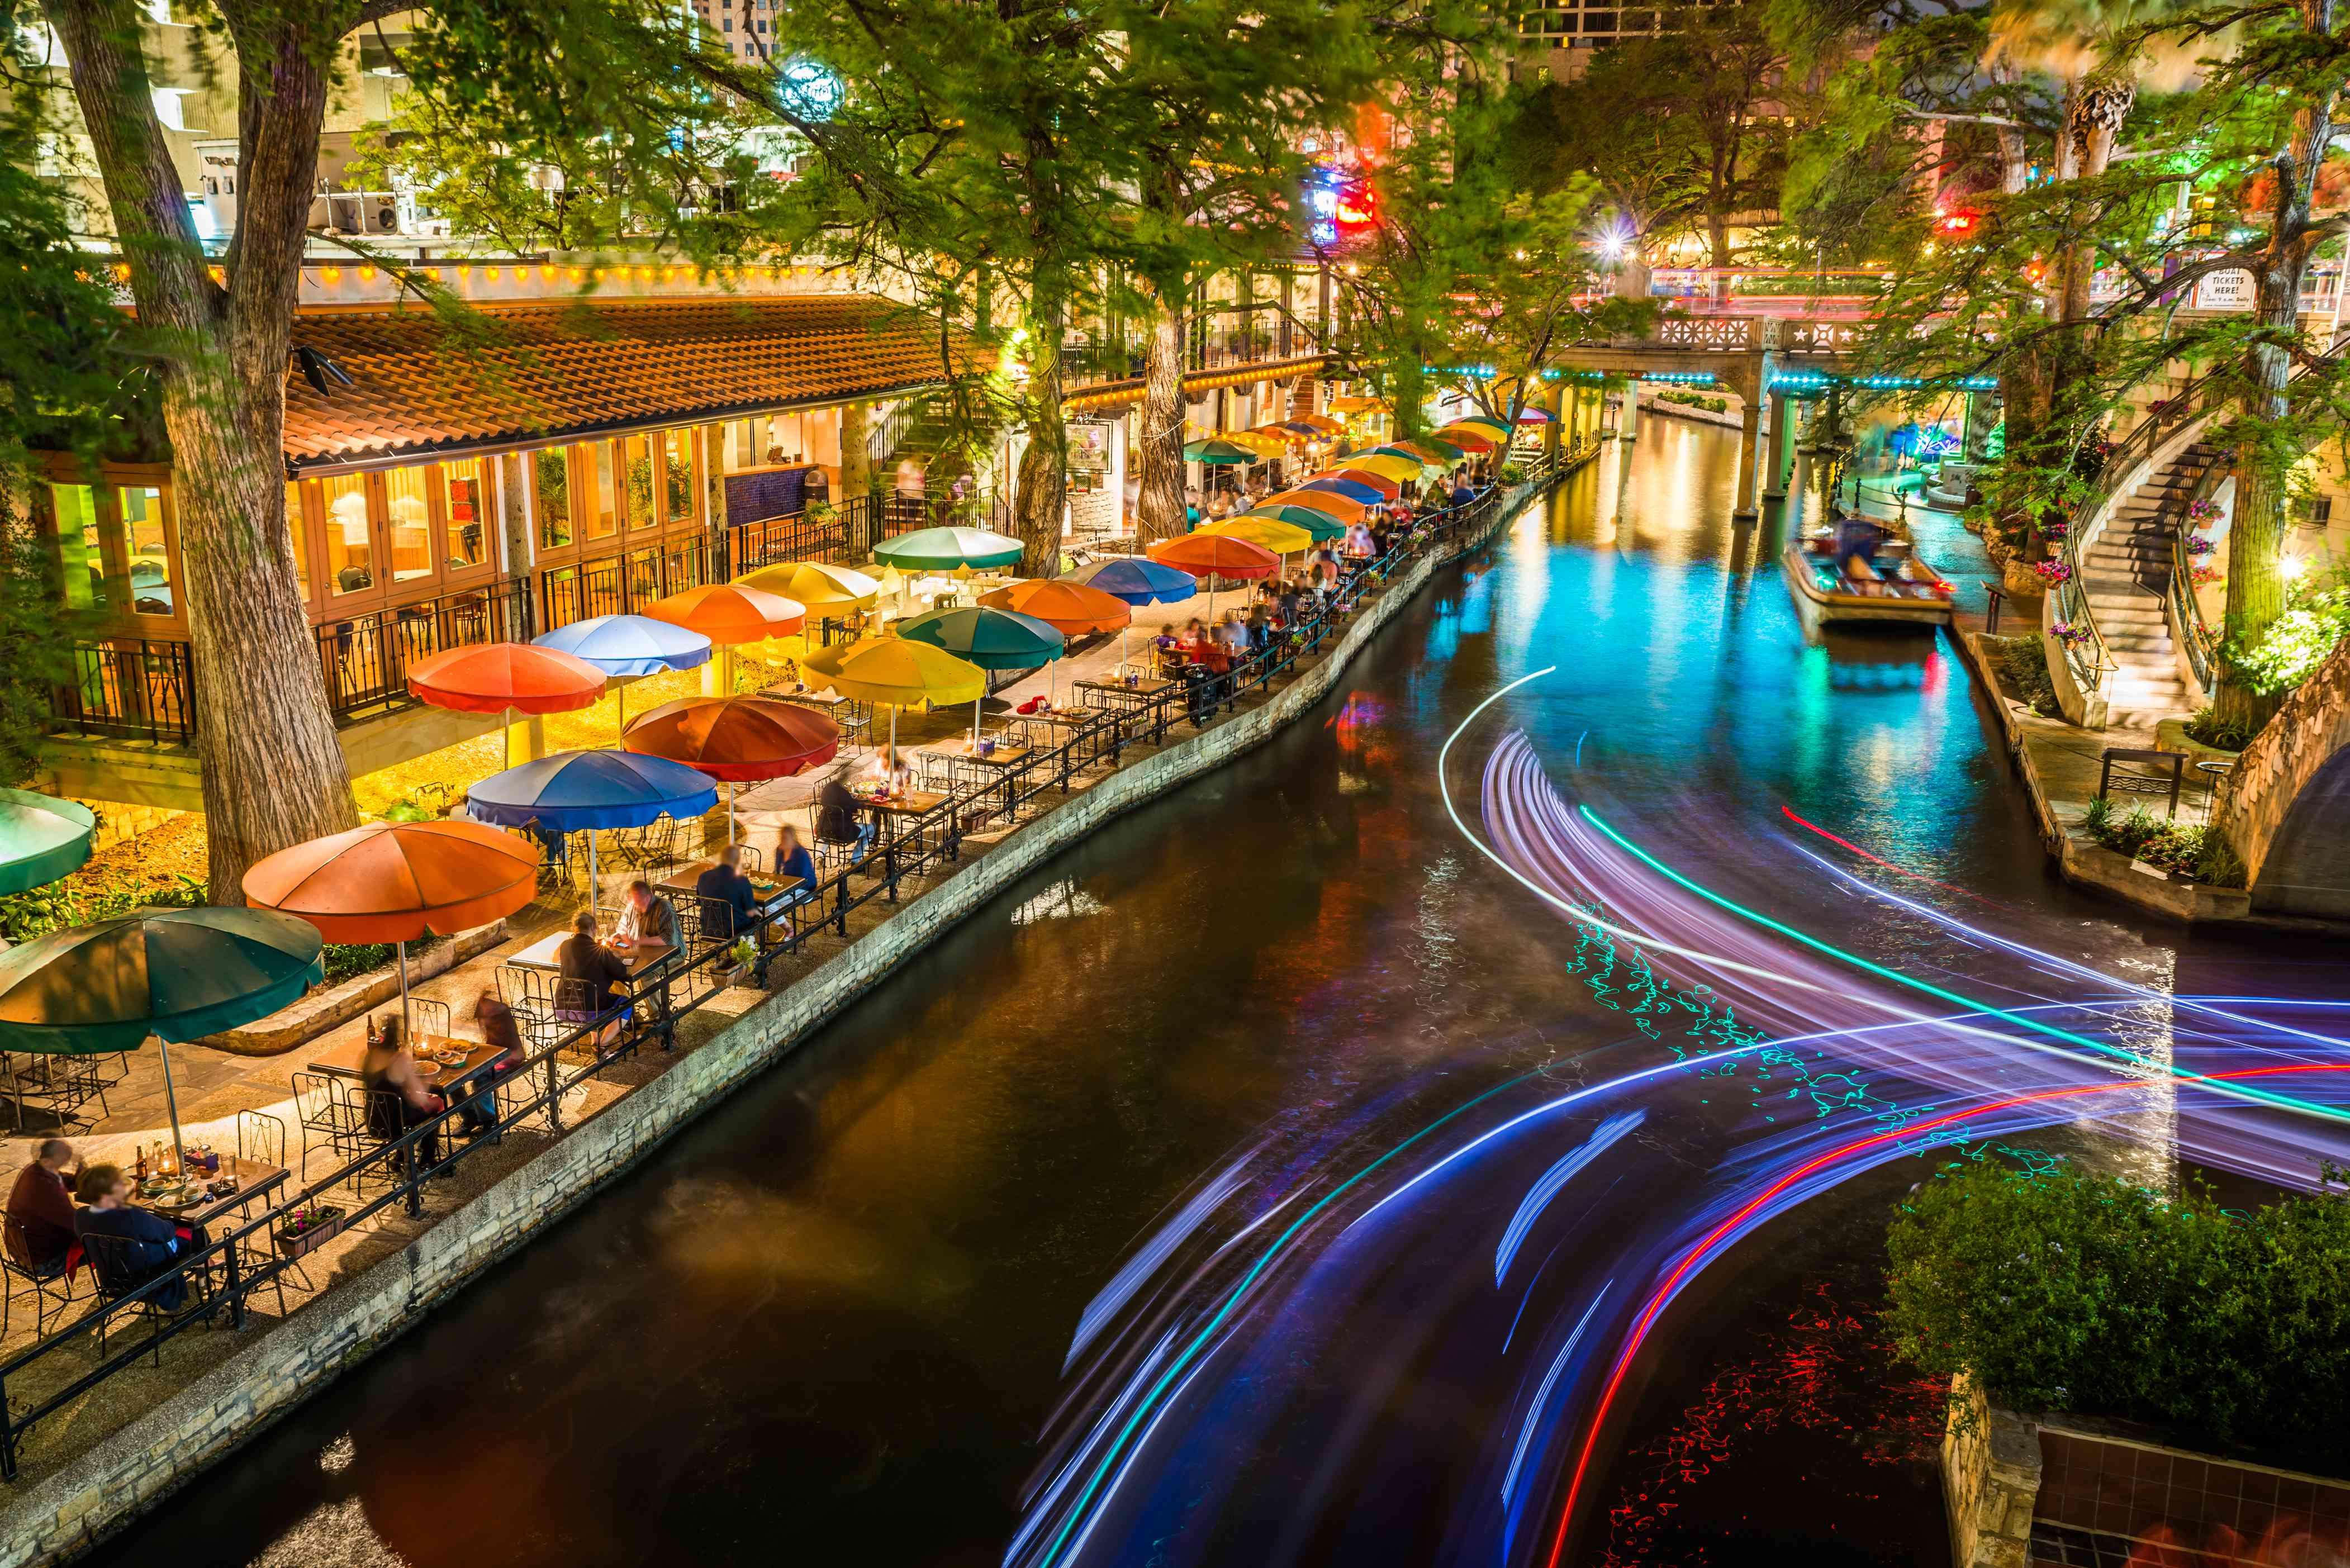 Long exposure image of the San Antonio Riverwalk at night